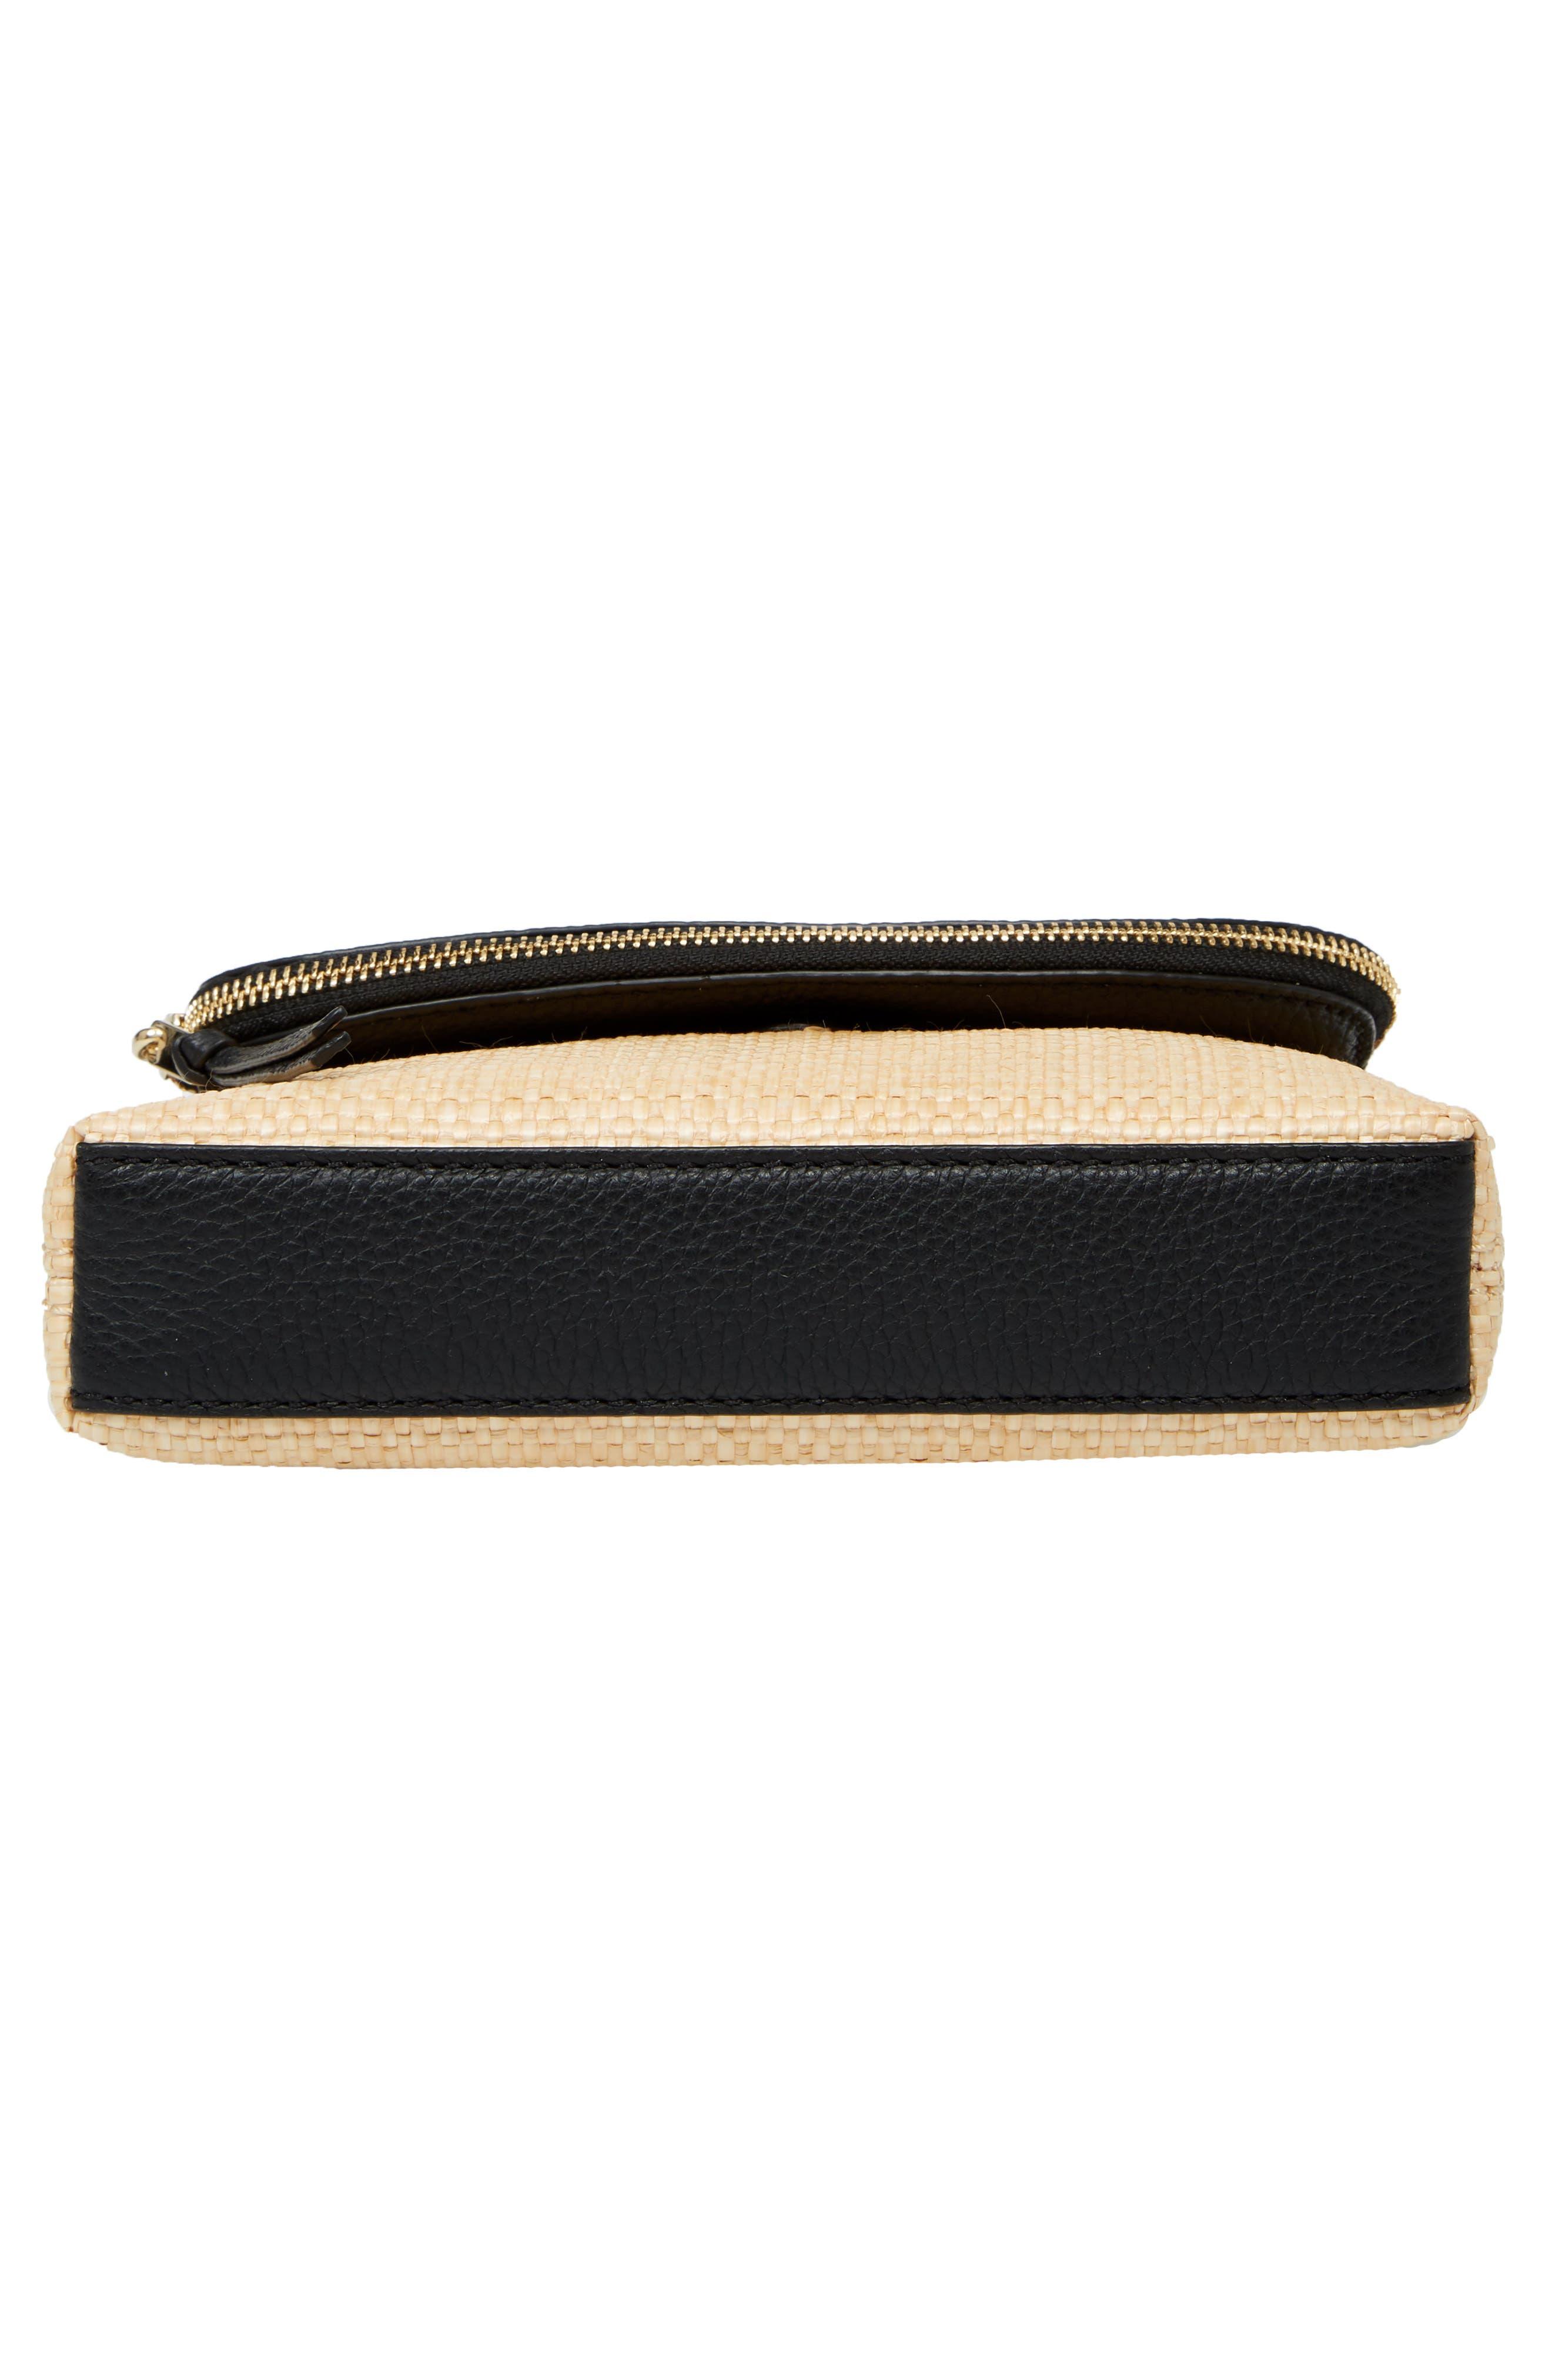 jackson street – harlyn straw & leather crossbody bag,                             Alternate thumbnail 3, color,                             Light Natural